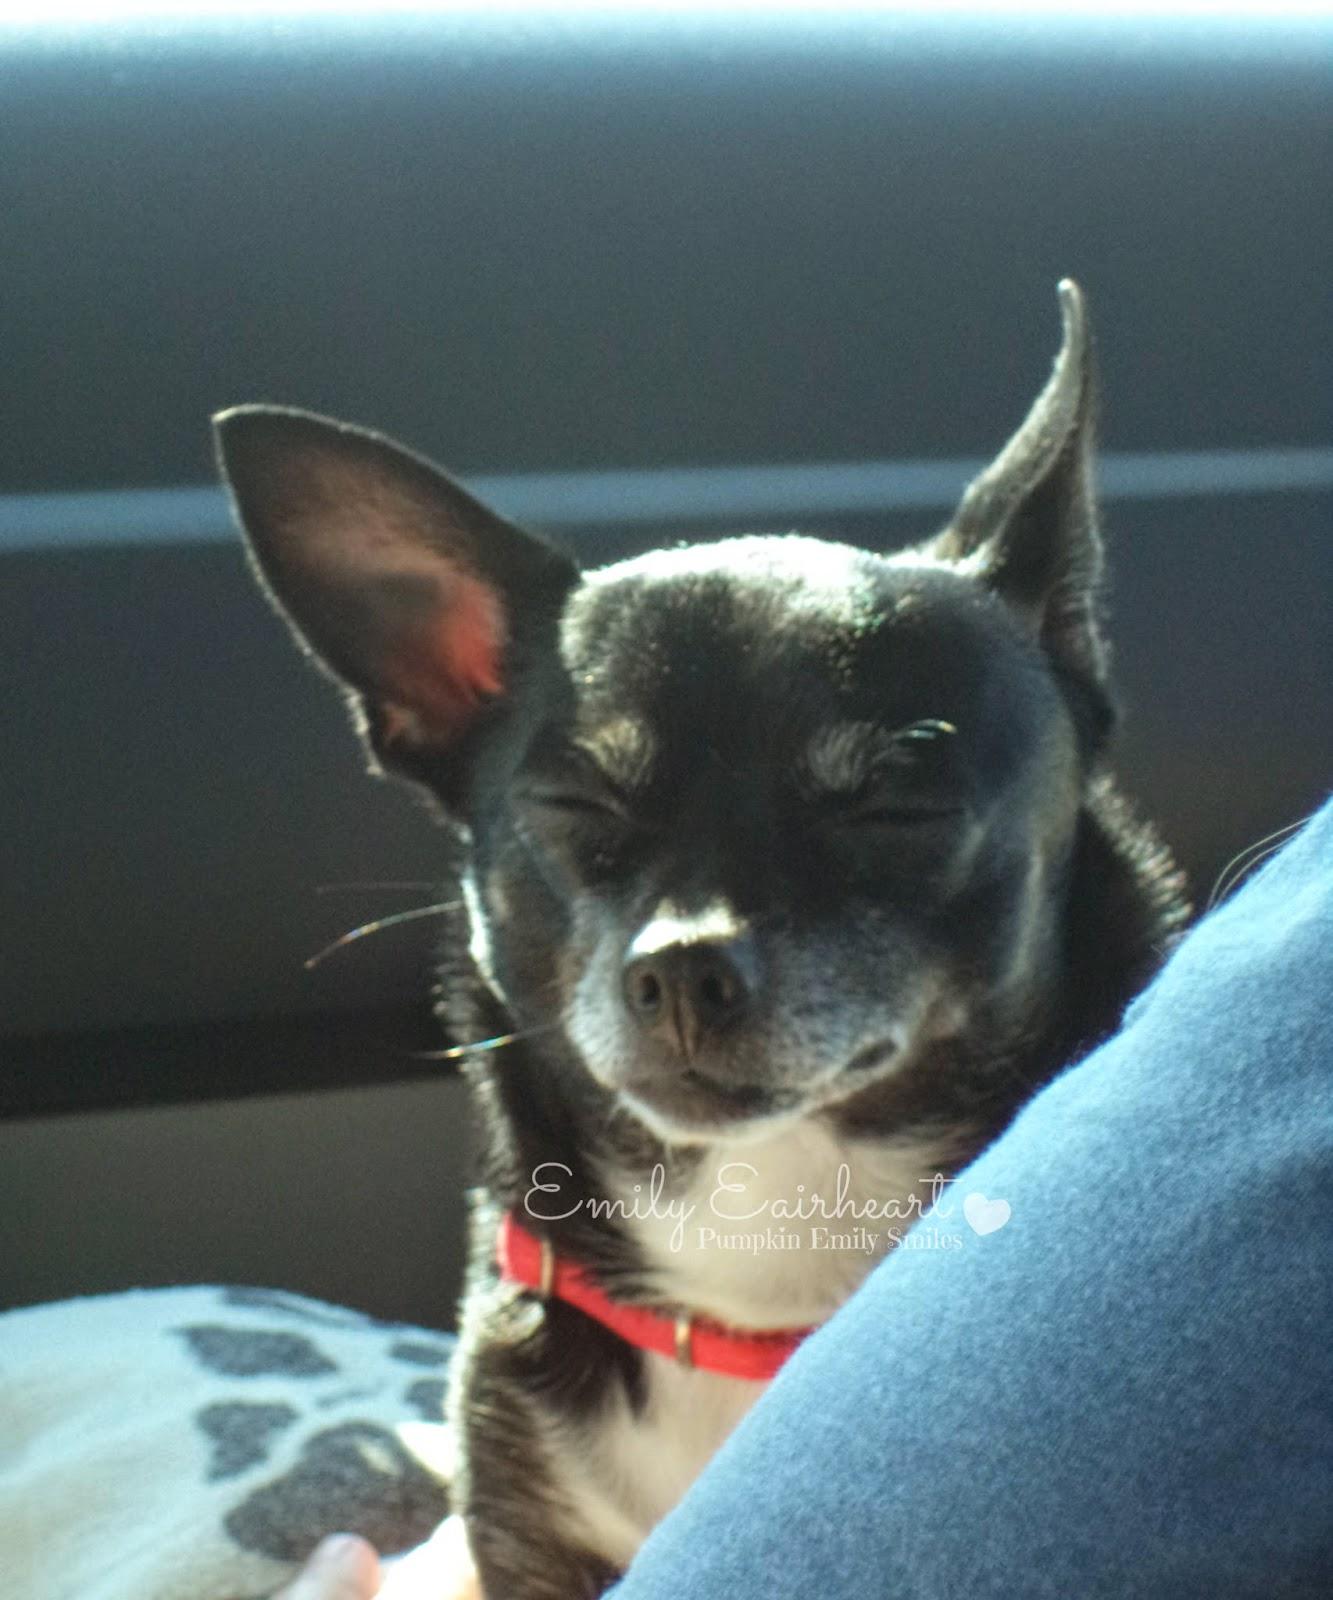 Minnie, Chihuahua closing her eyes